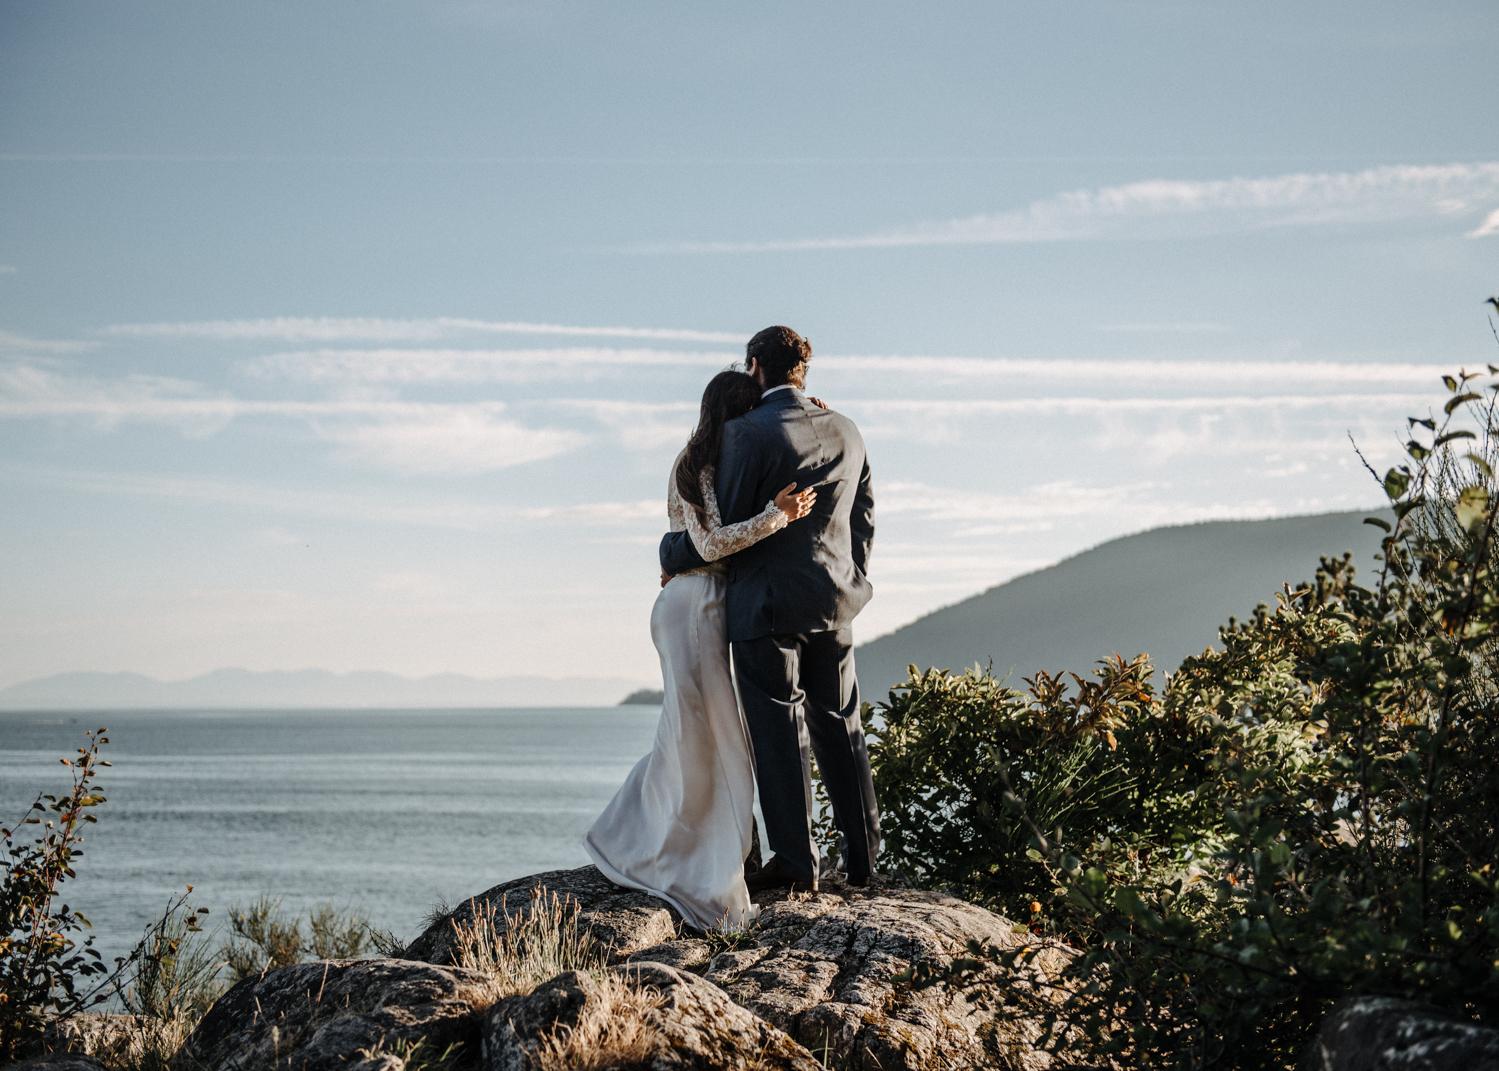 kaoverii_silva_photographer_lison_iman_wedding_websize-300.jpg